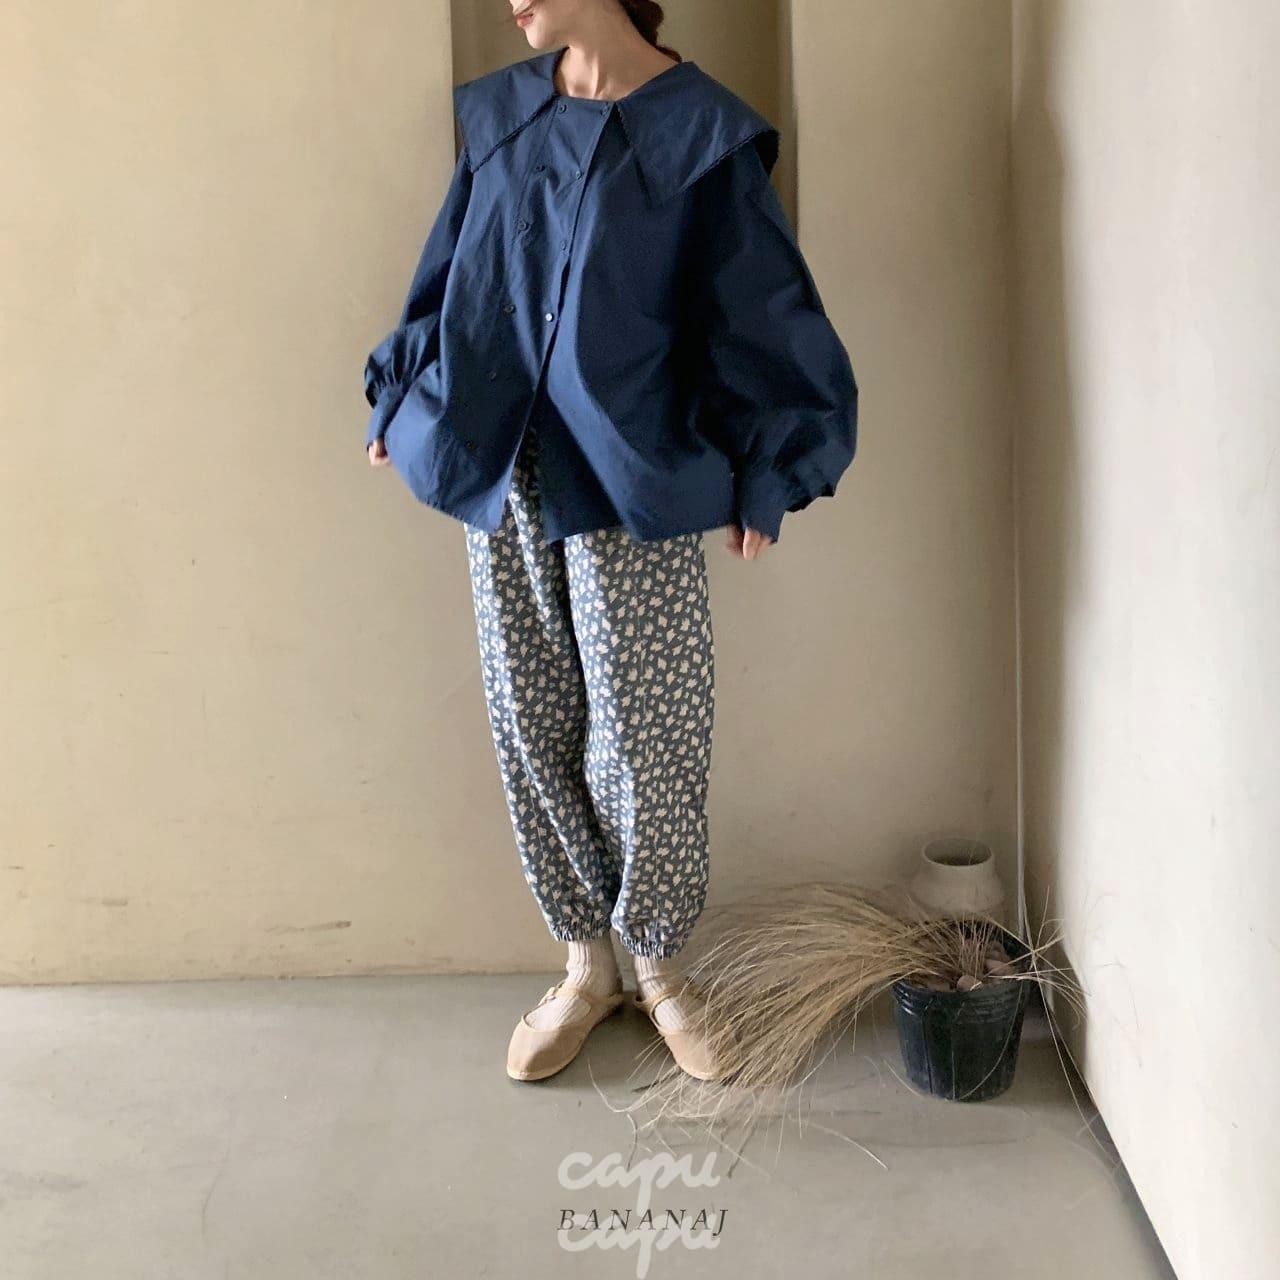 «sold out»«ママサイズ» banana j flower pants フラワーパンツ 2colors